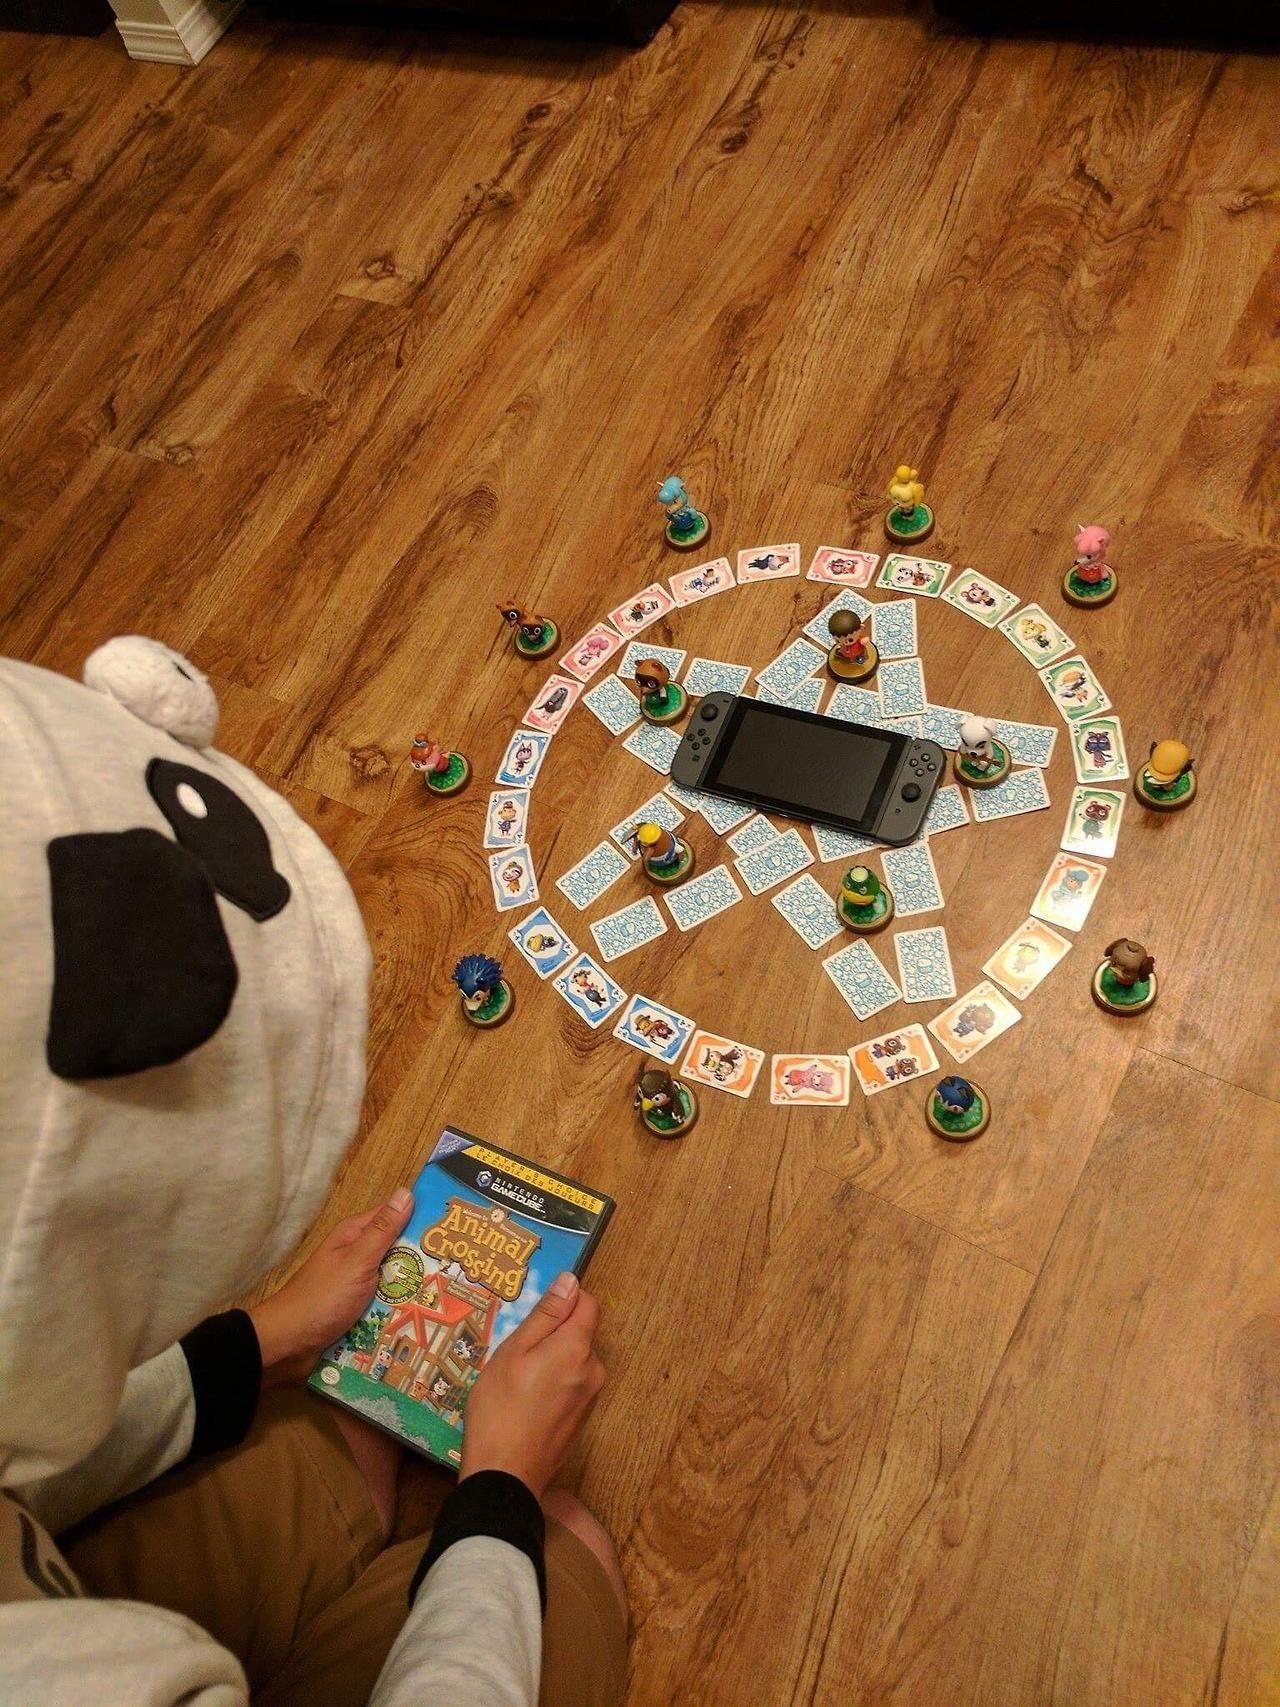 Summoning My Nintendo E3 Dream via /r/gaming Animal